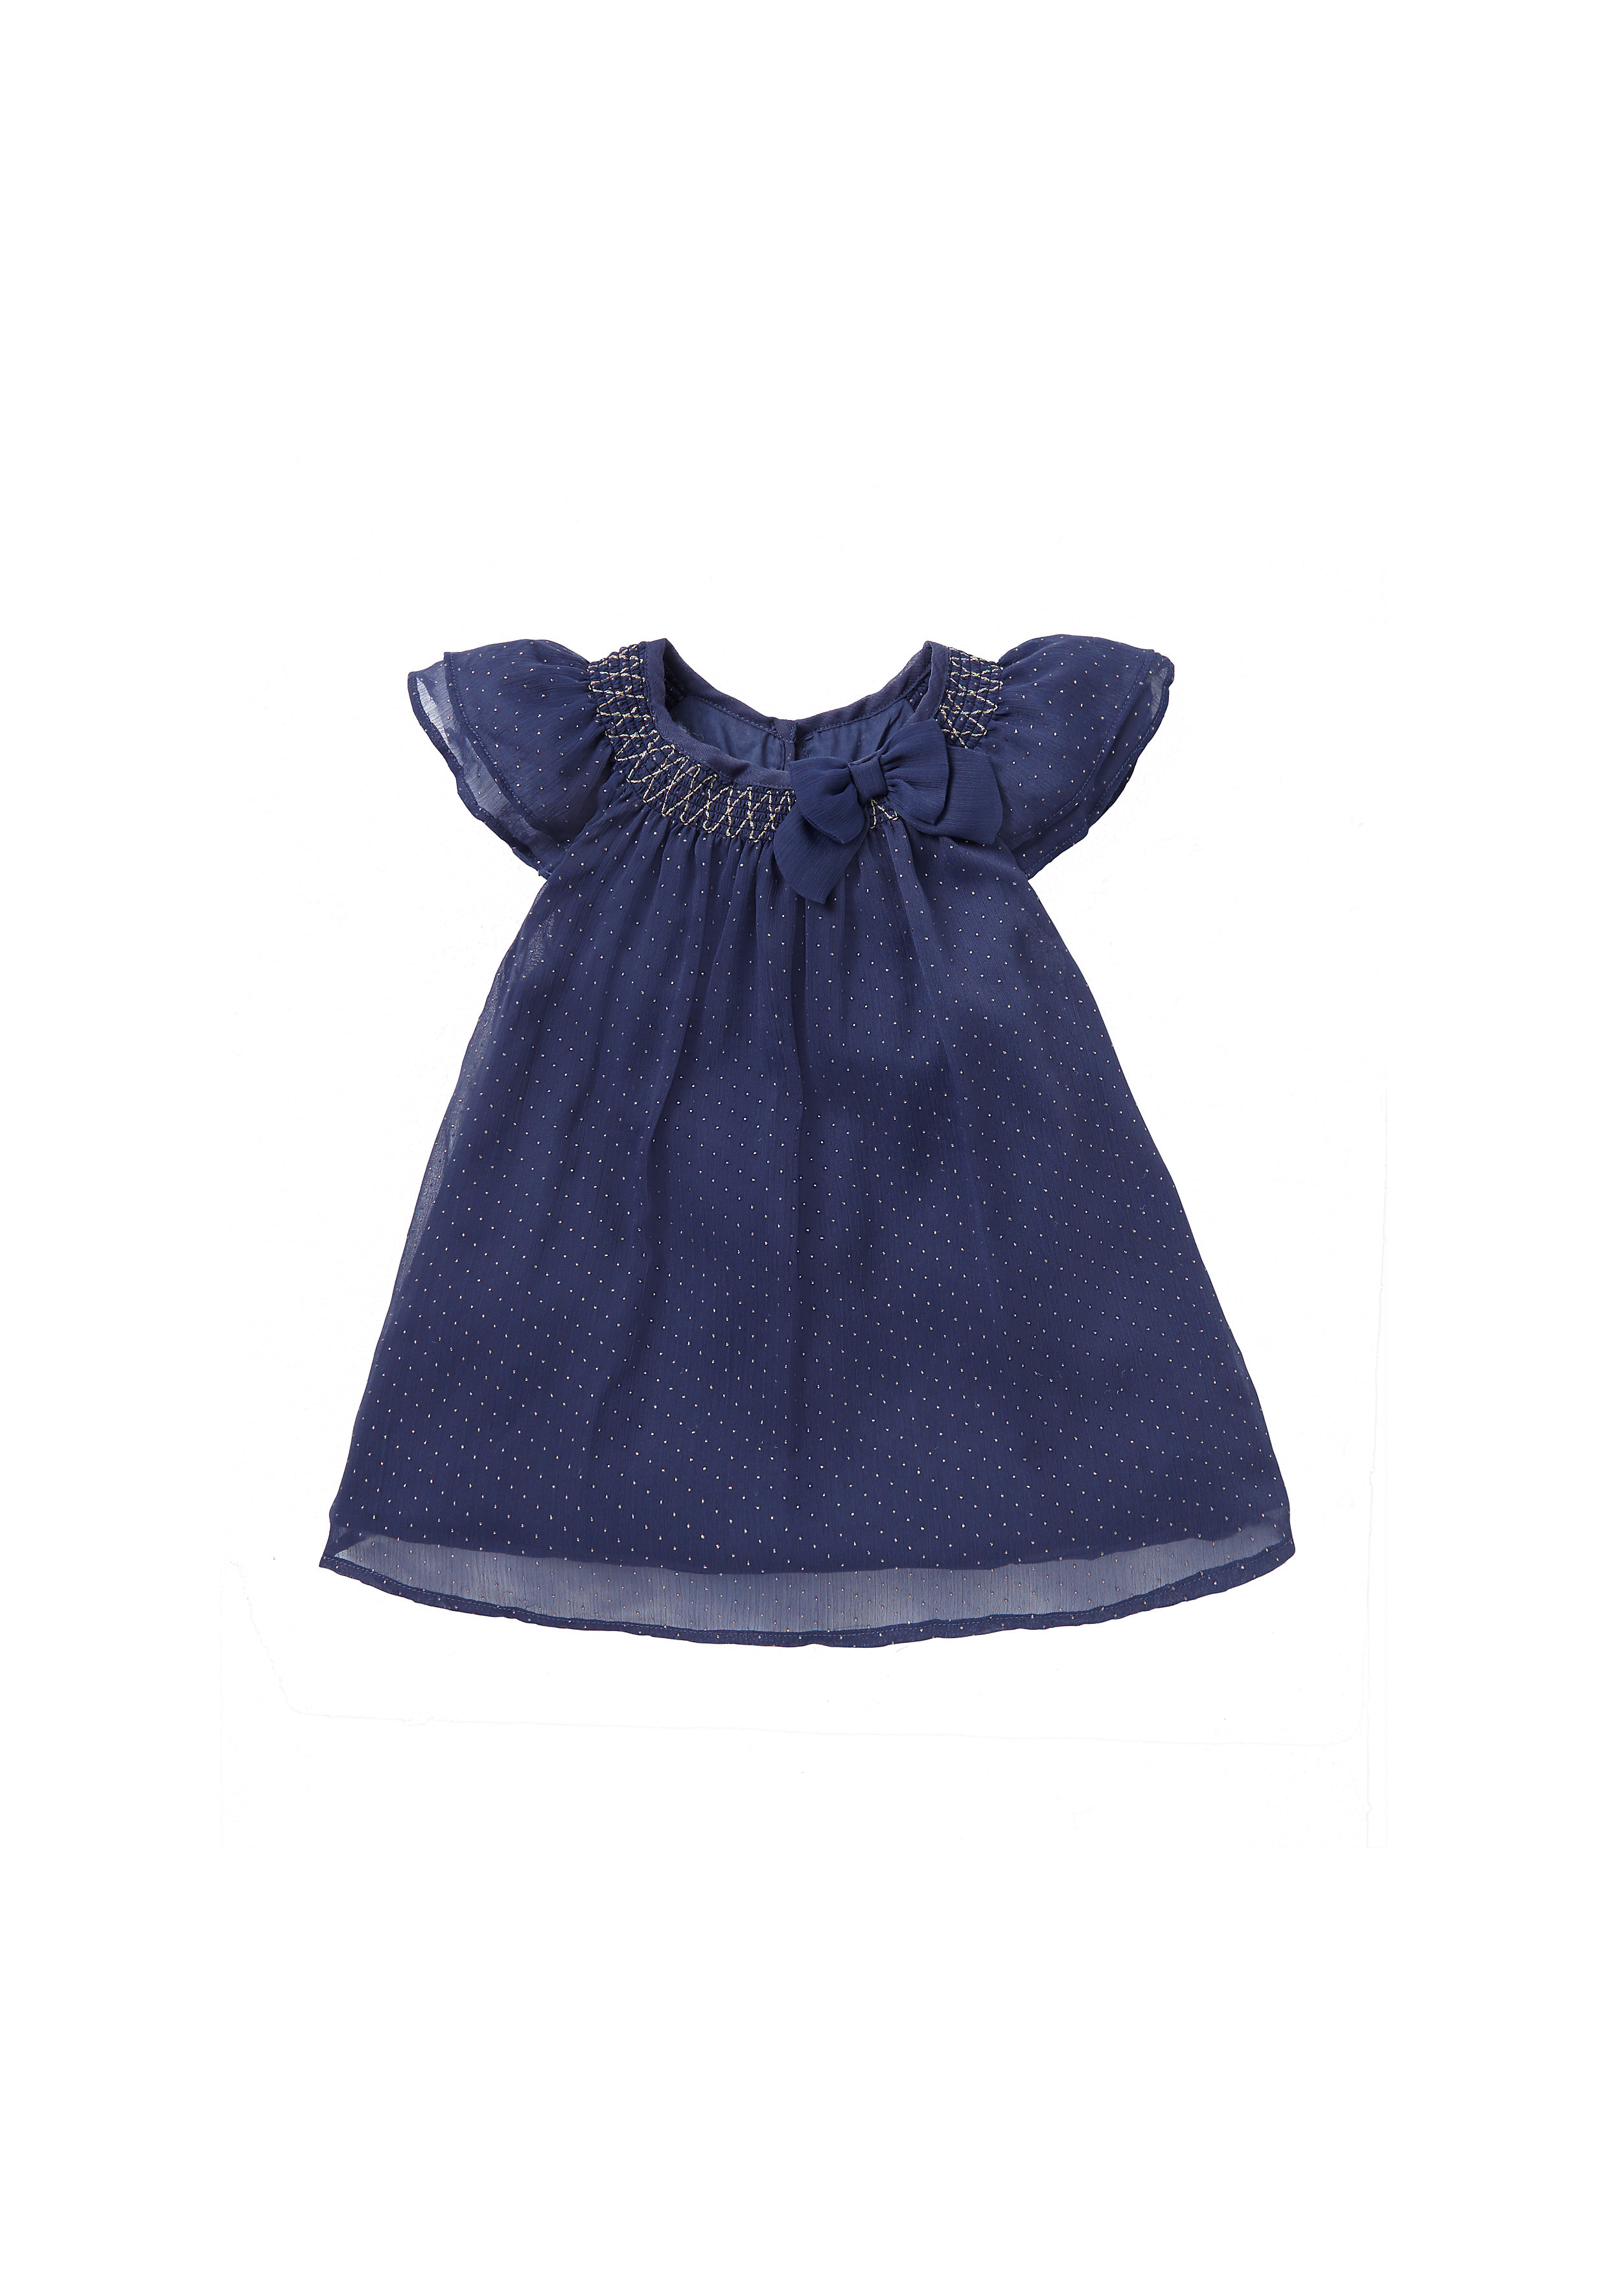 Mothercare | Girls Navy Tunic - Navy